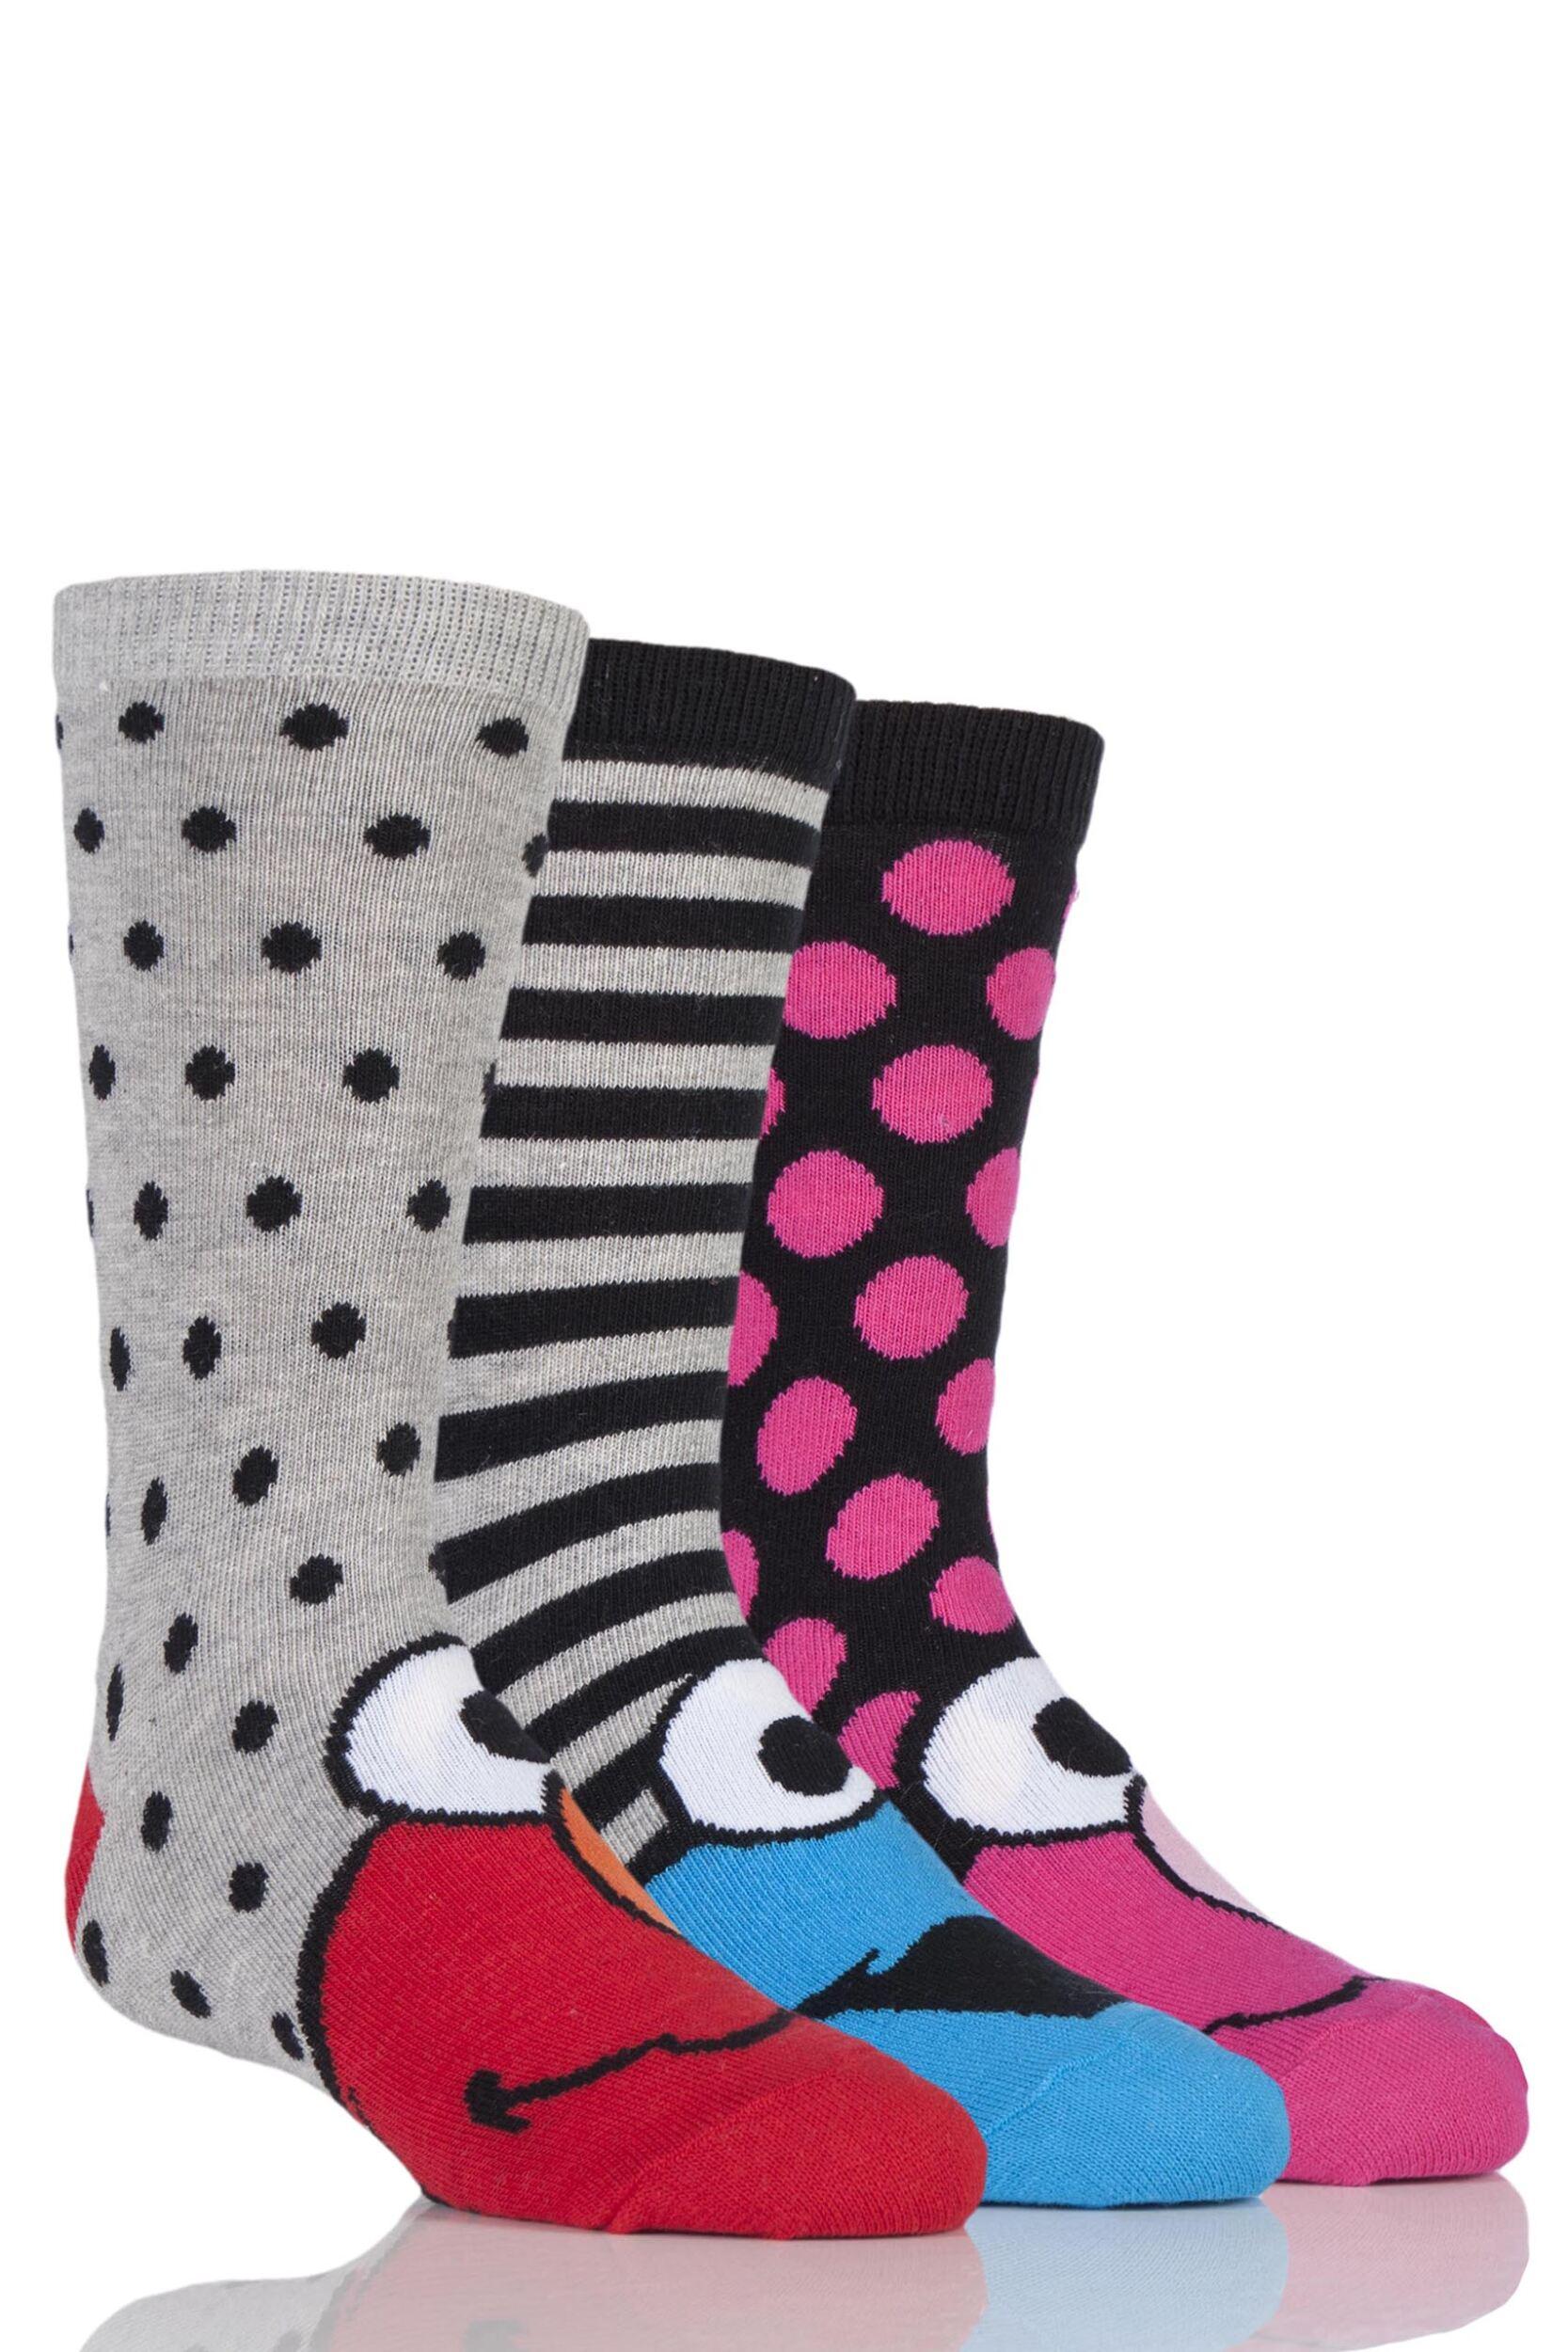 Kids 3 Pair SockShop Sesame Street Socks